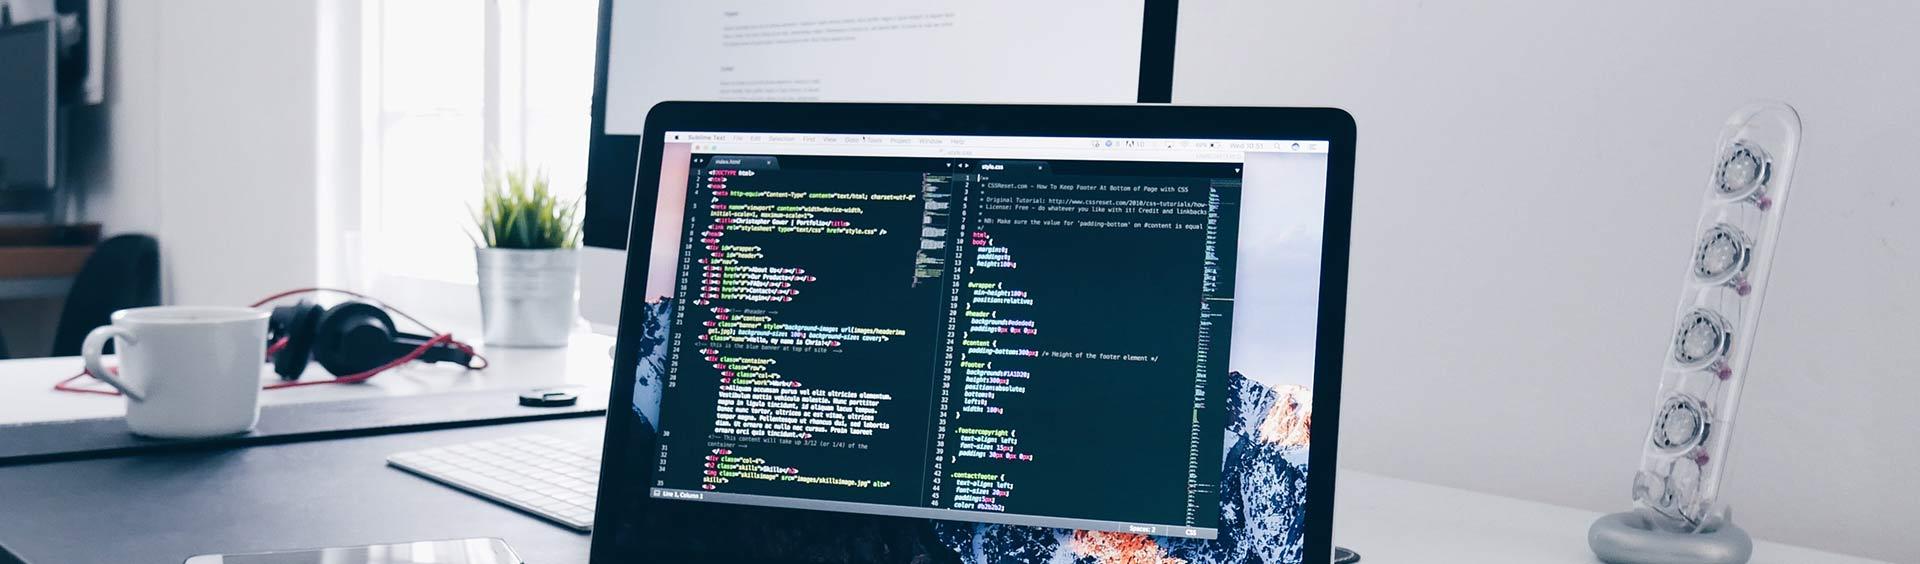 Nadine Schmelter web developer Webdesign